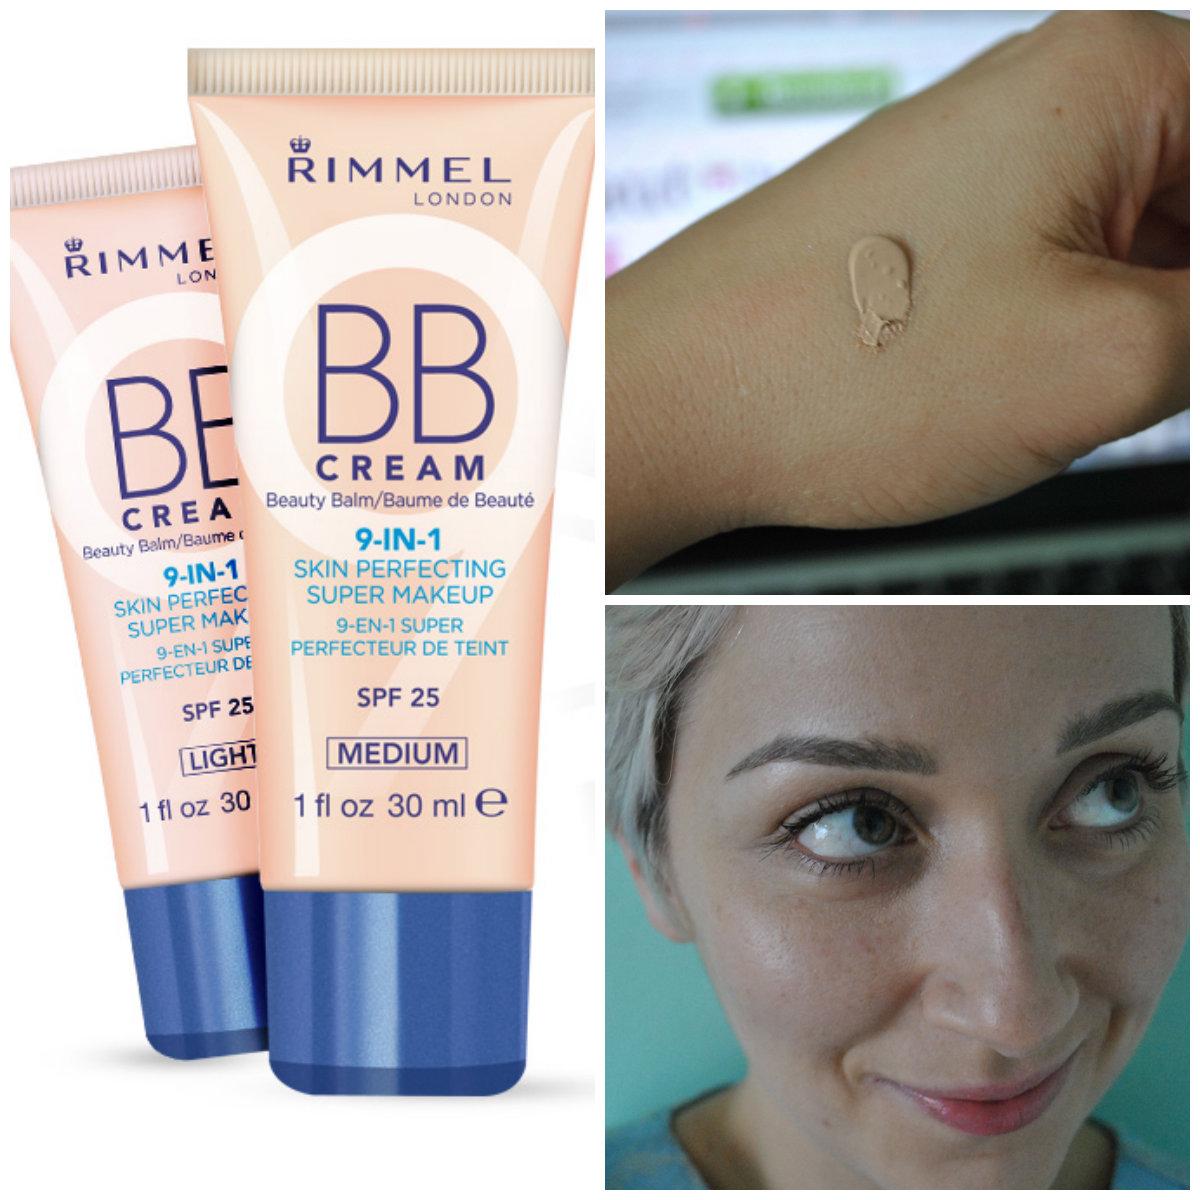 Rimmel BB Cream 9 in 1 Skin Perfecting Super Makeup: Primes ...